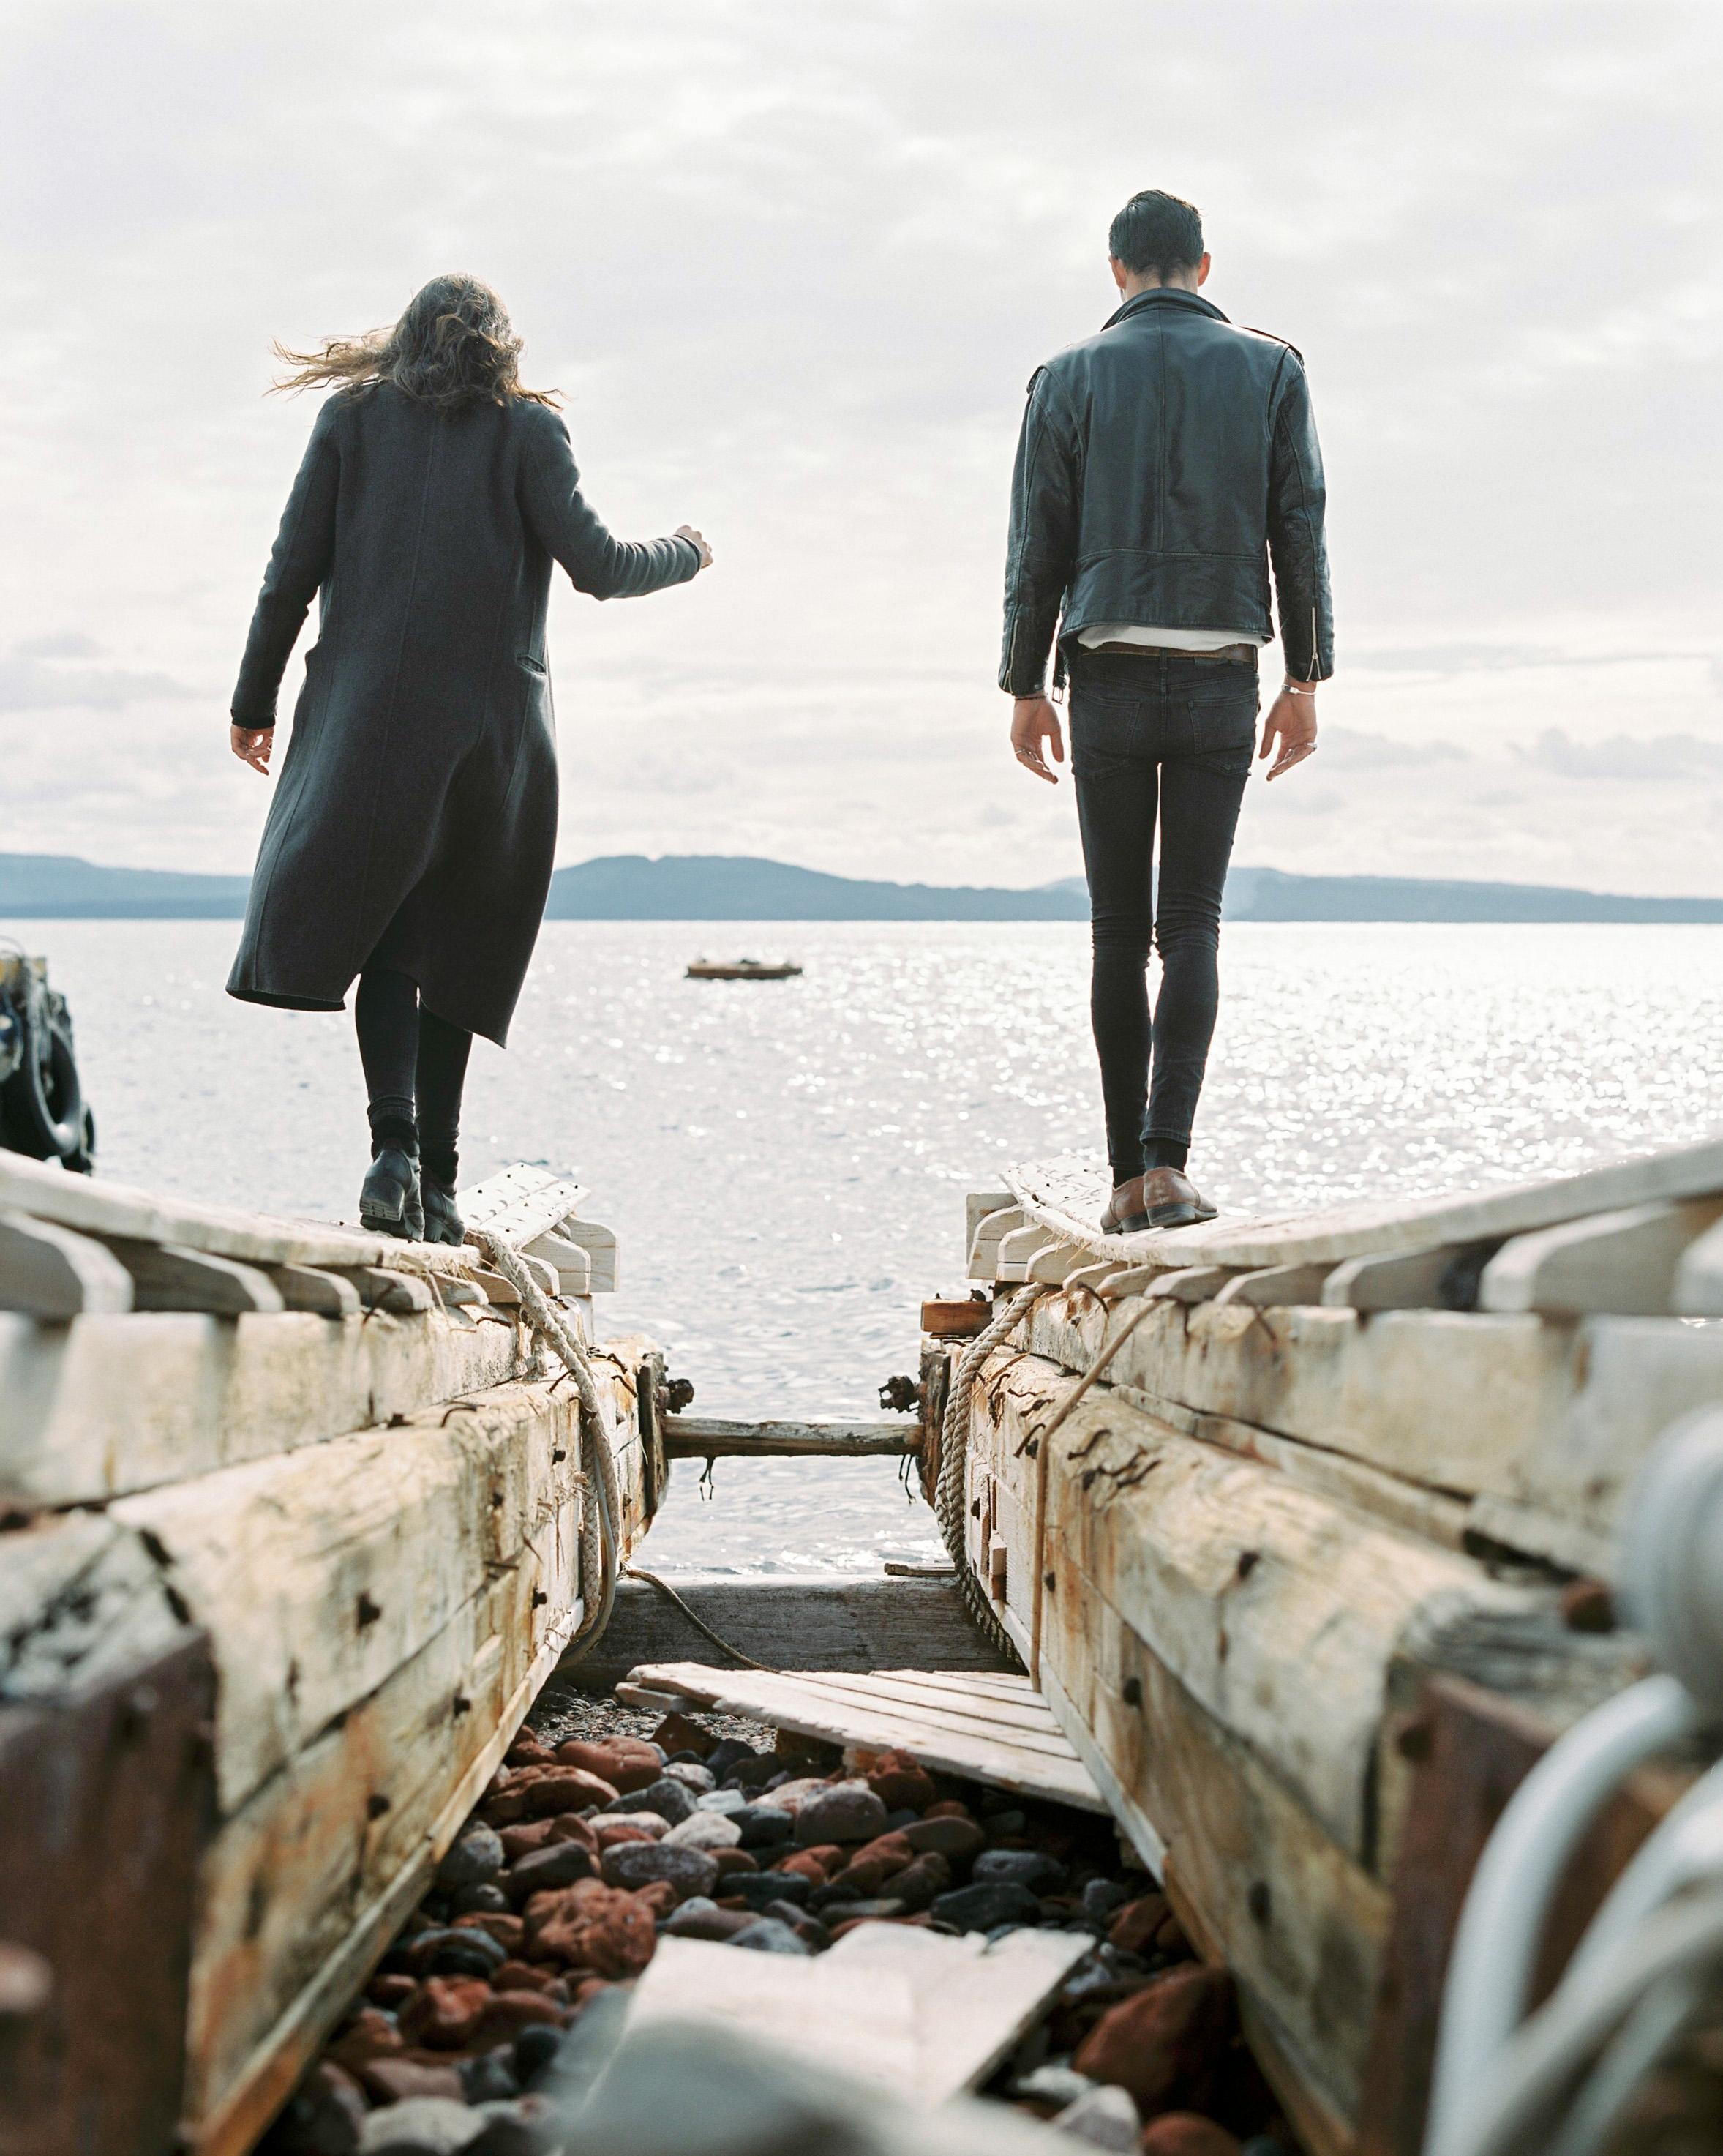 celinehamelin-photographe-couple-argentique-loversession-grece-santorin-argentique-filmphotography-greece21.jpg